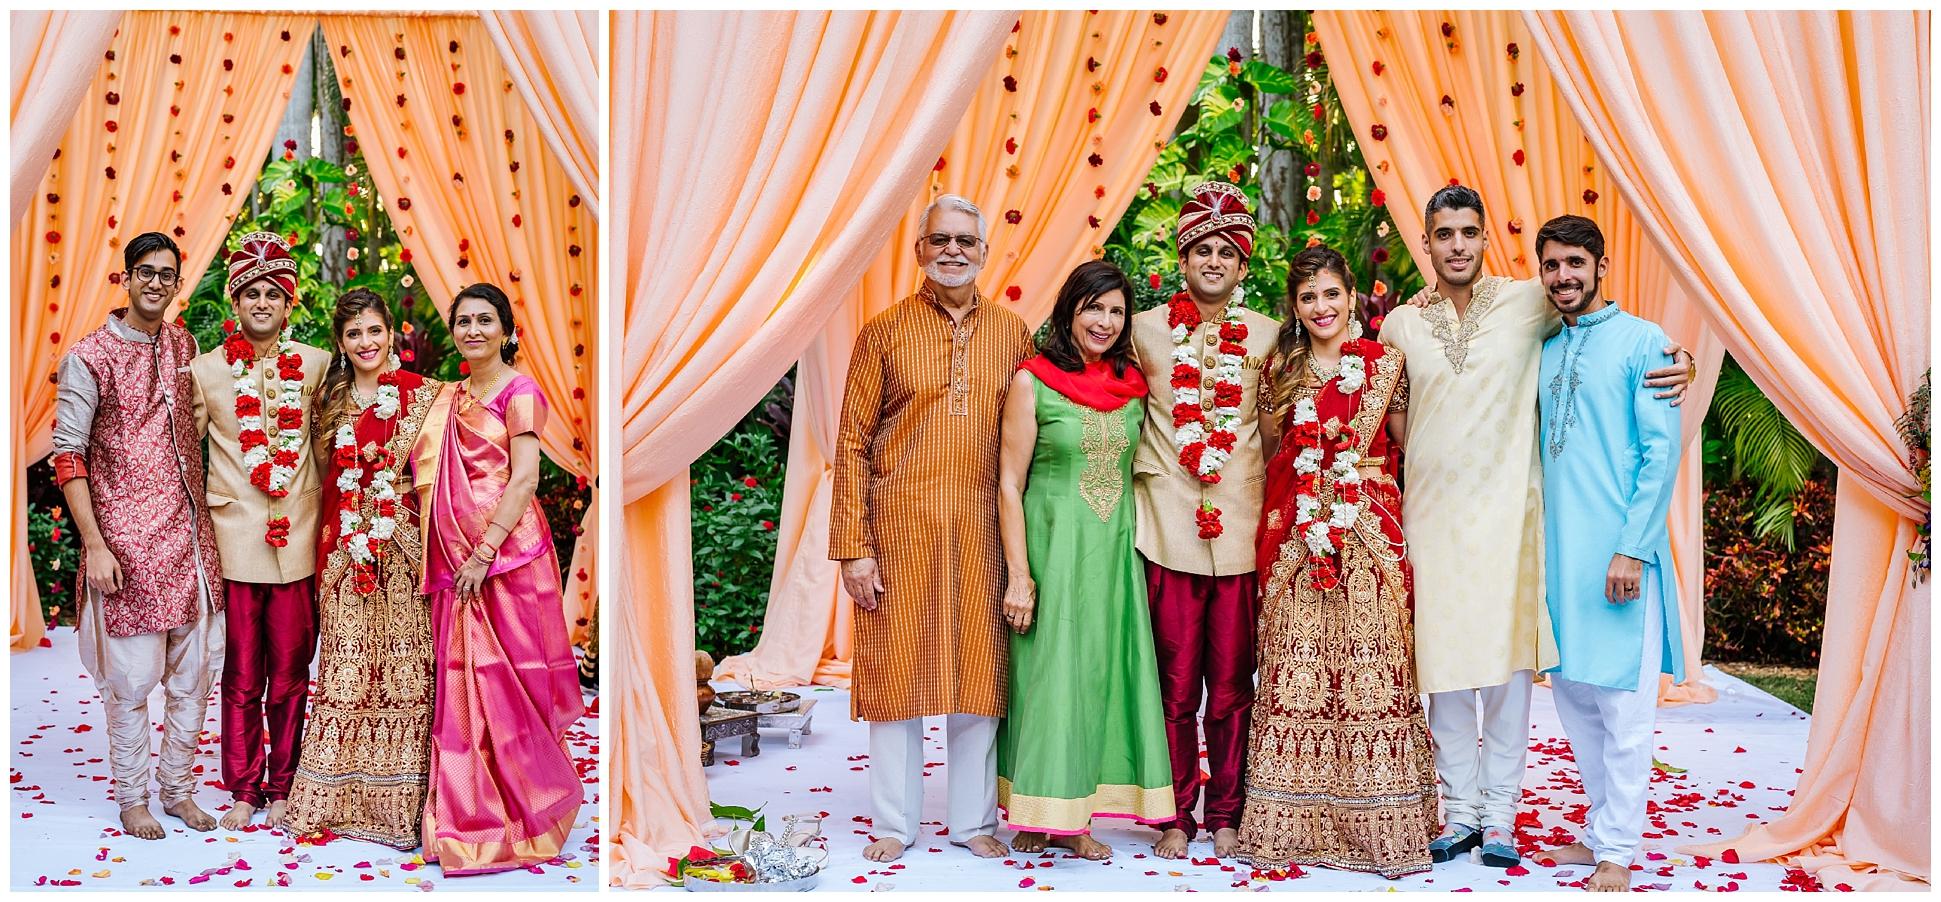 St-pete-indian-wedding-photographer-barat-sunken-gardens_0126.jpg